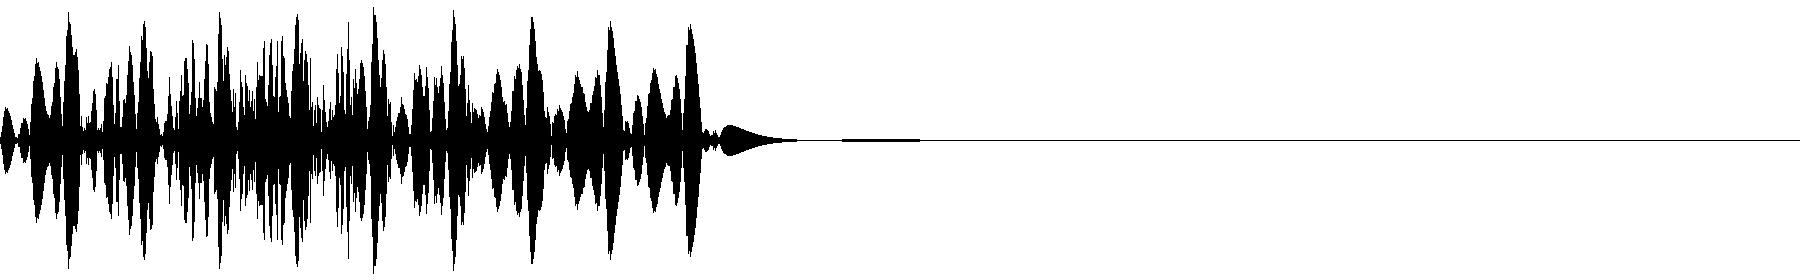 vedh synth cut 092 gm